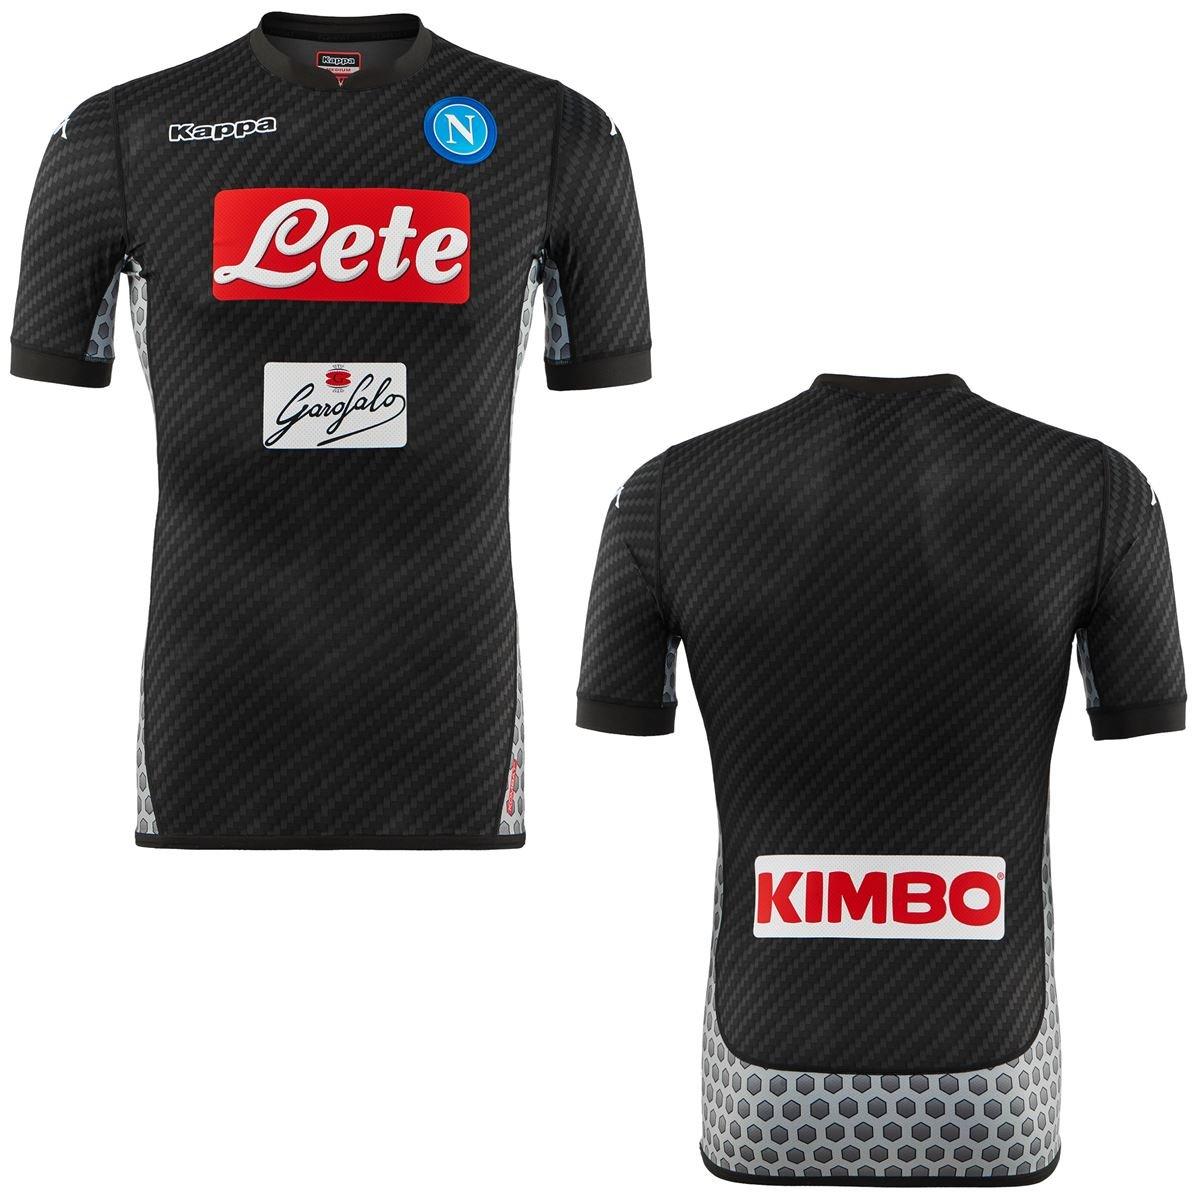 2017-2018 Napoli Kappa Authentic 4th Shirt B077S2FZHL 4L|ブラック ブラック 4L